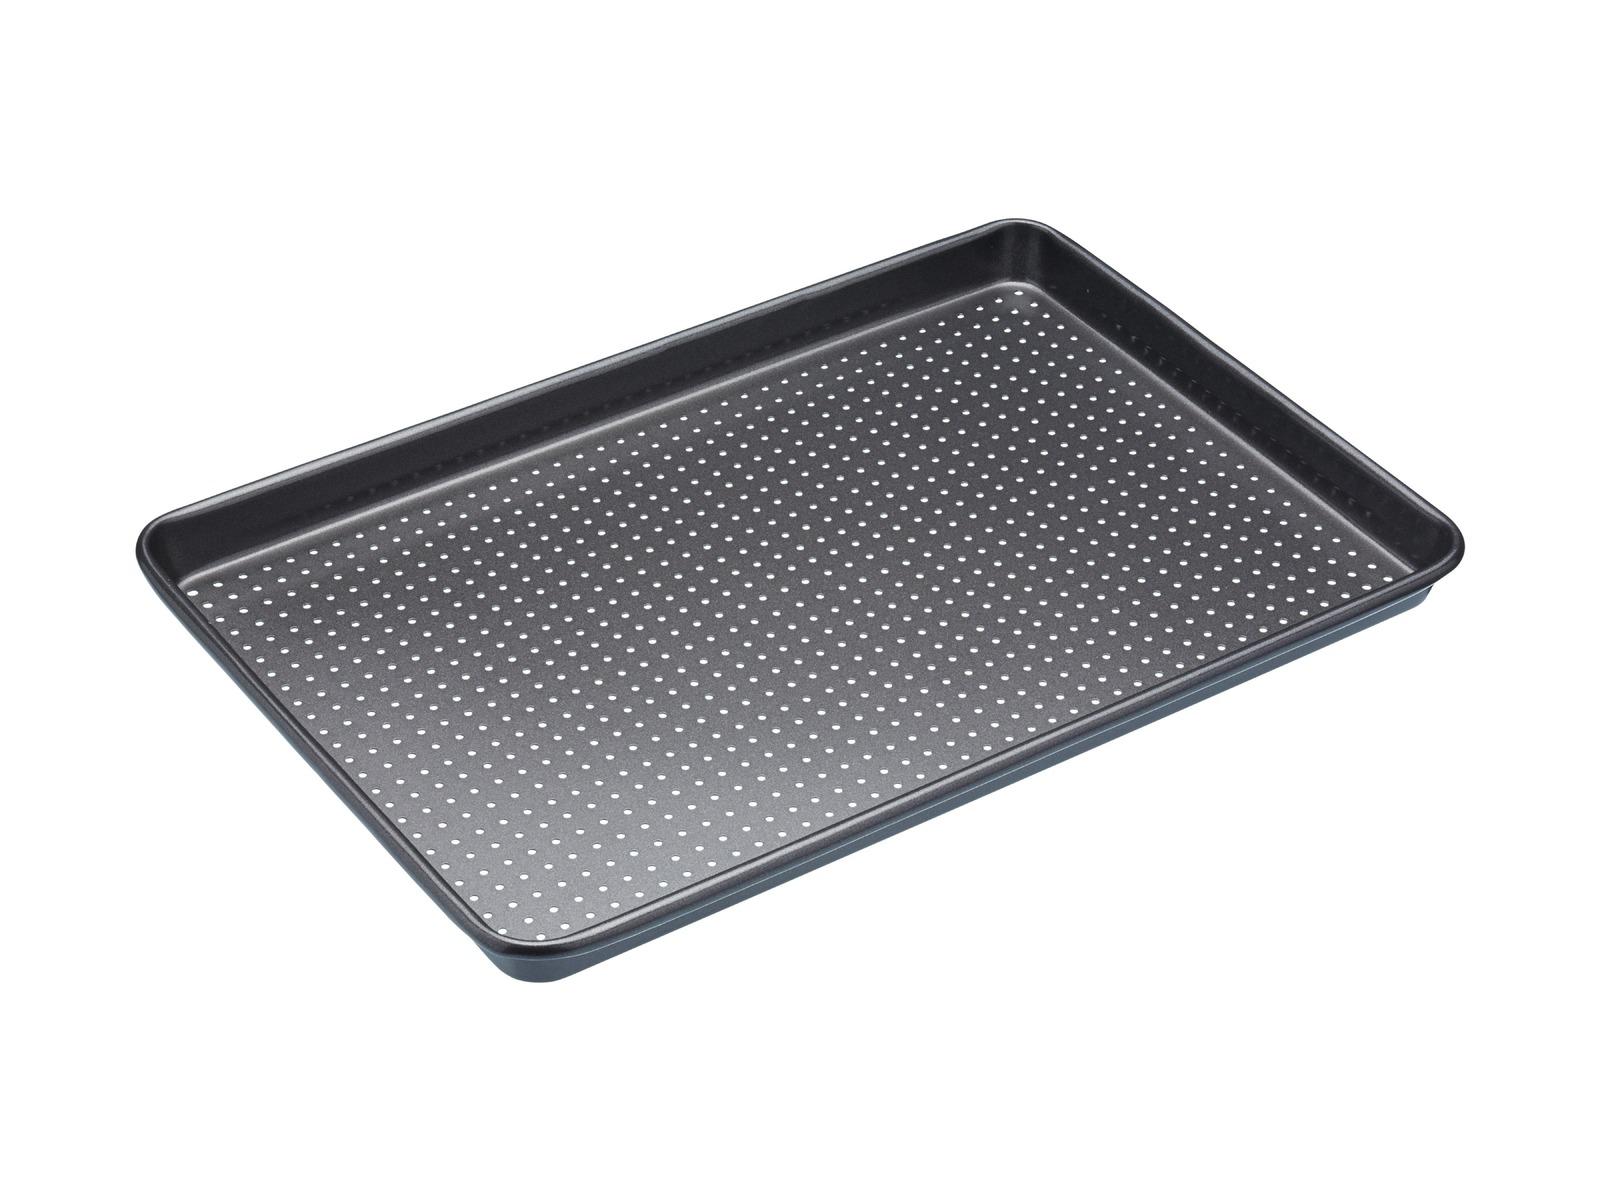 MasterClass: Crusty Bake Baking Tray (39.5x27cm) image